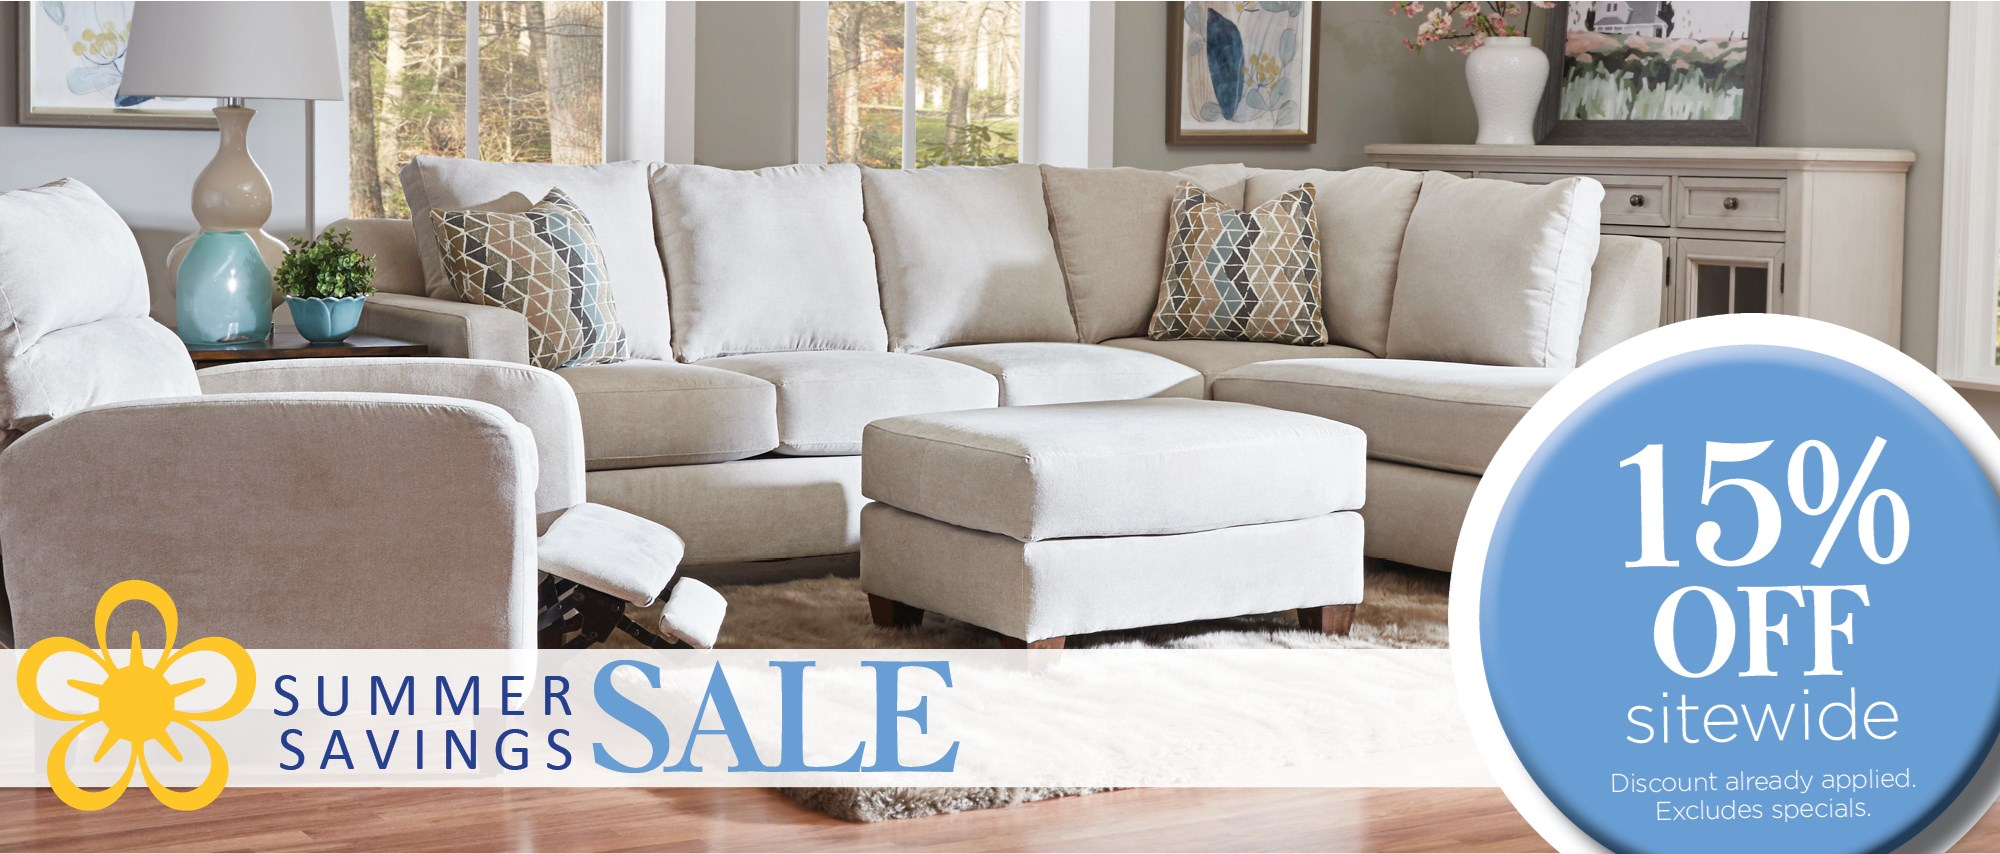 Memorial Sale Heldover - 20% off sitewide + Bonus CODES